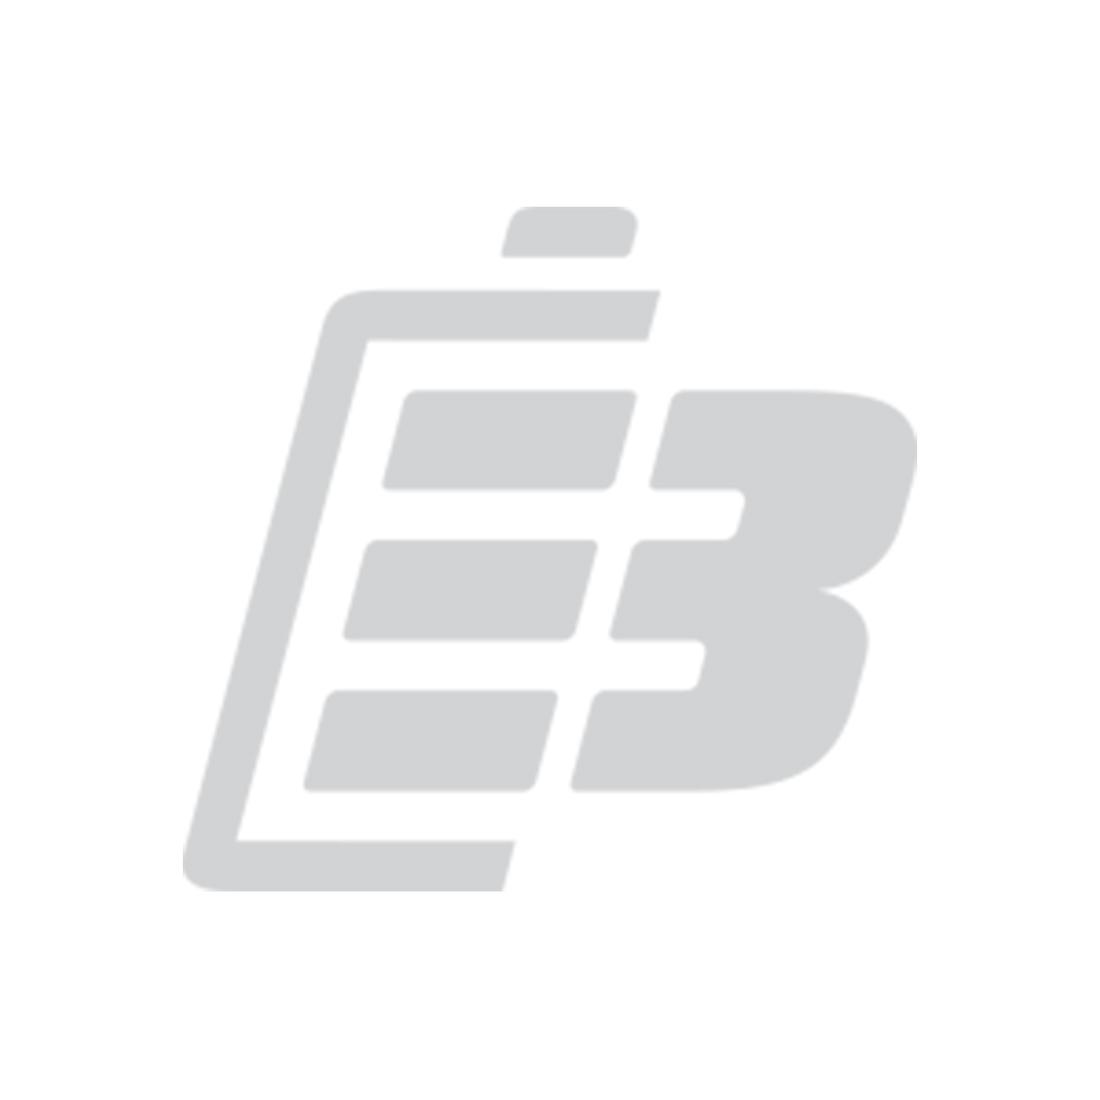 GPS battery Navigon 3300_1